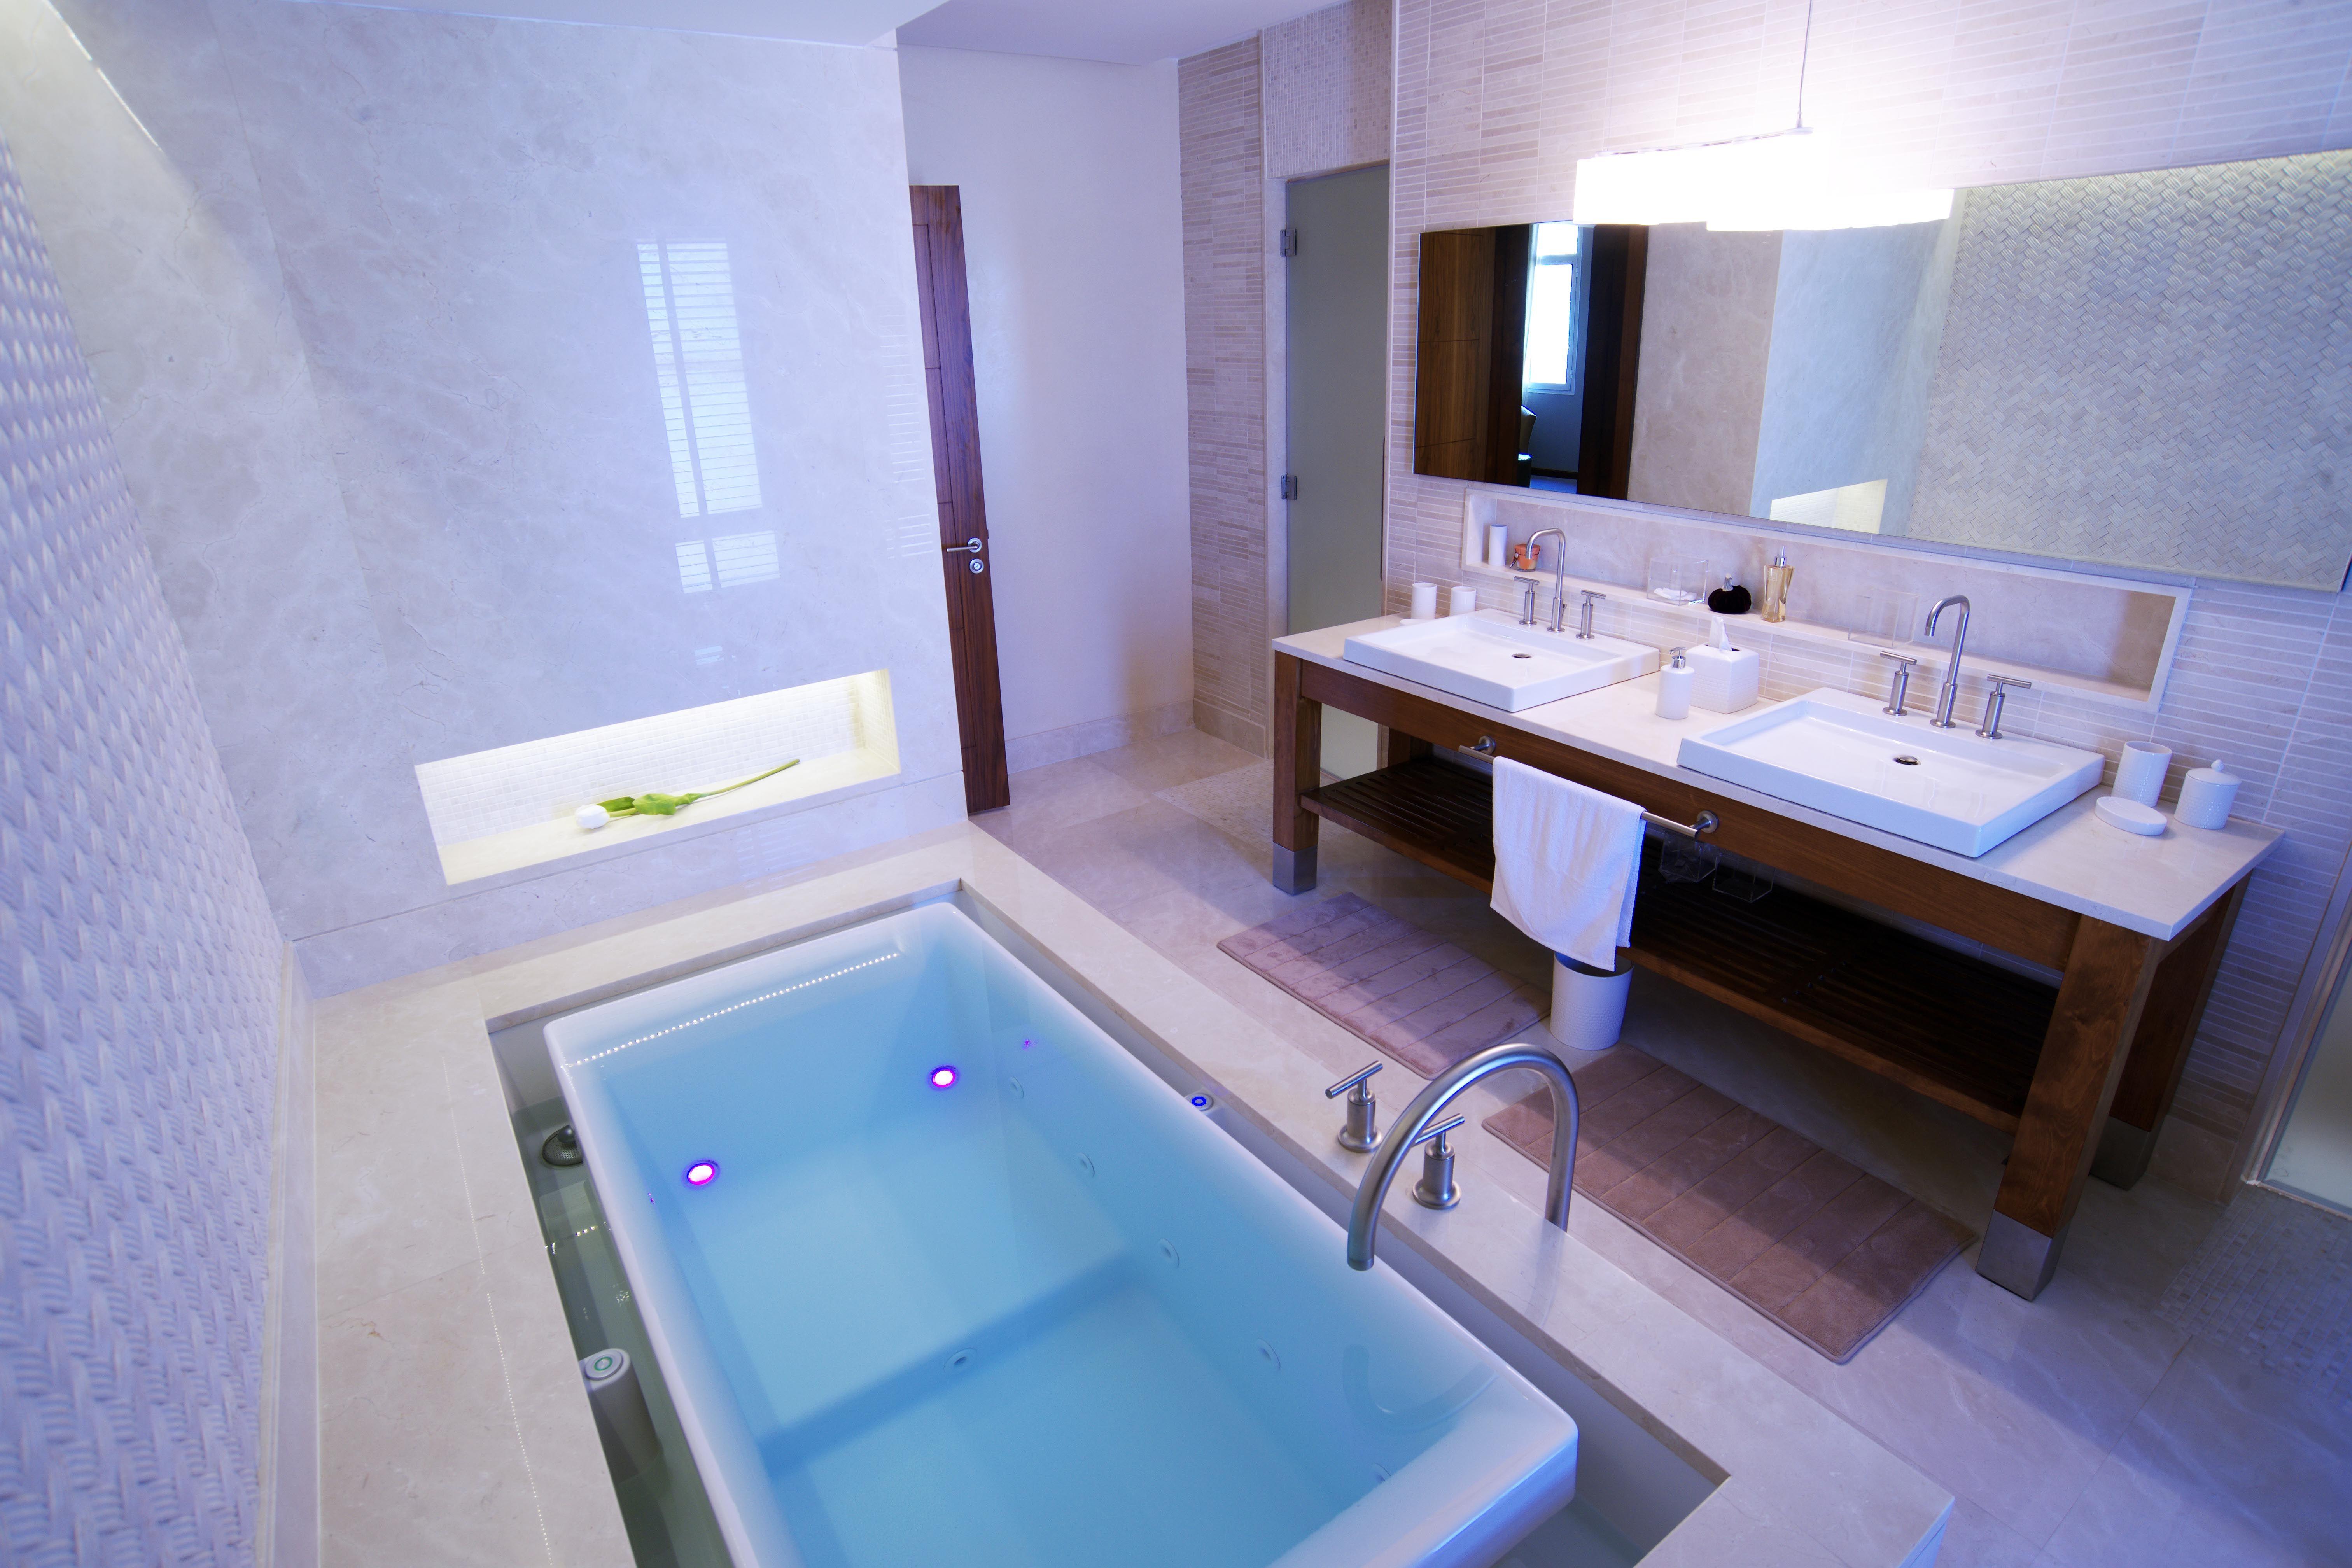 Master Bathroom Bathroom Remodel Idea Bathroom Bathroom Toilets